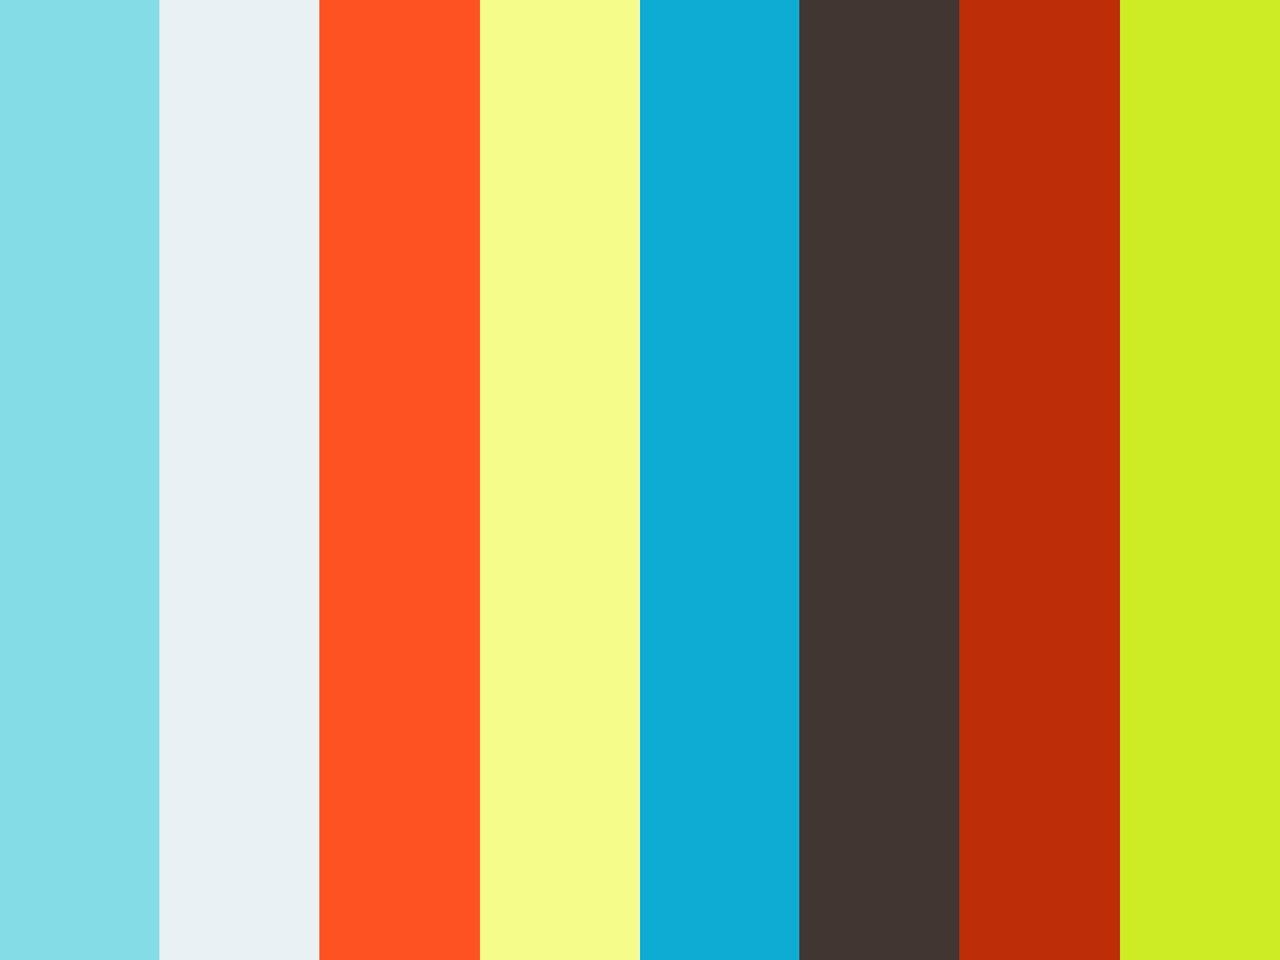 Ernst & Young - Tomorrow's Legacy - Strantwerpen